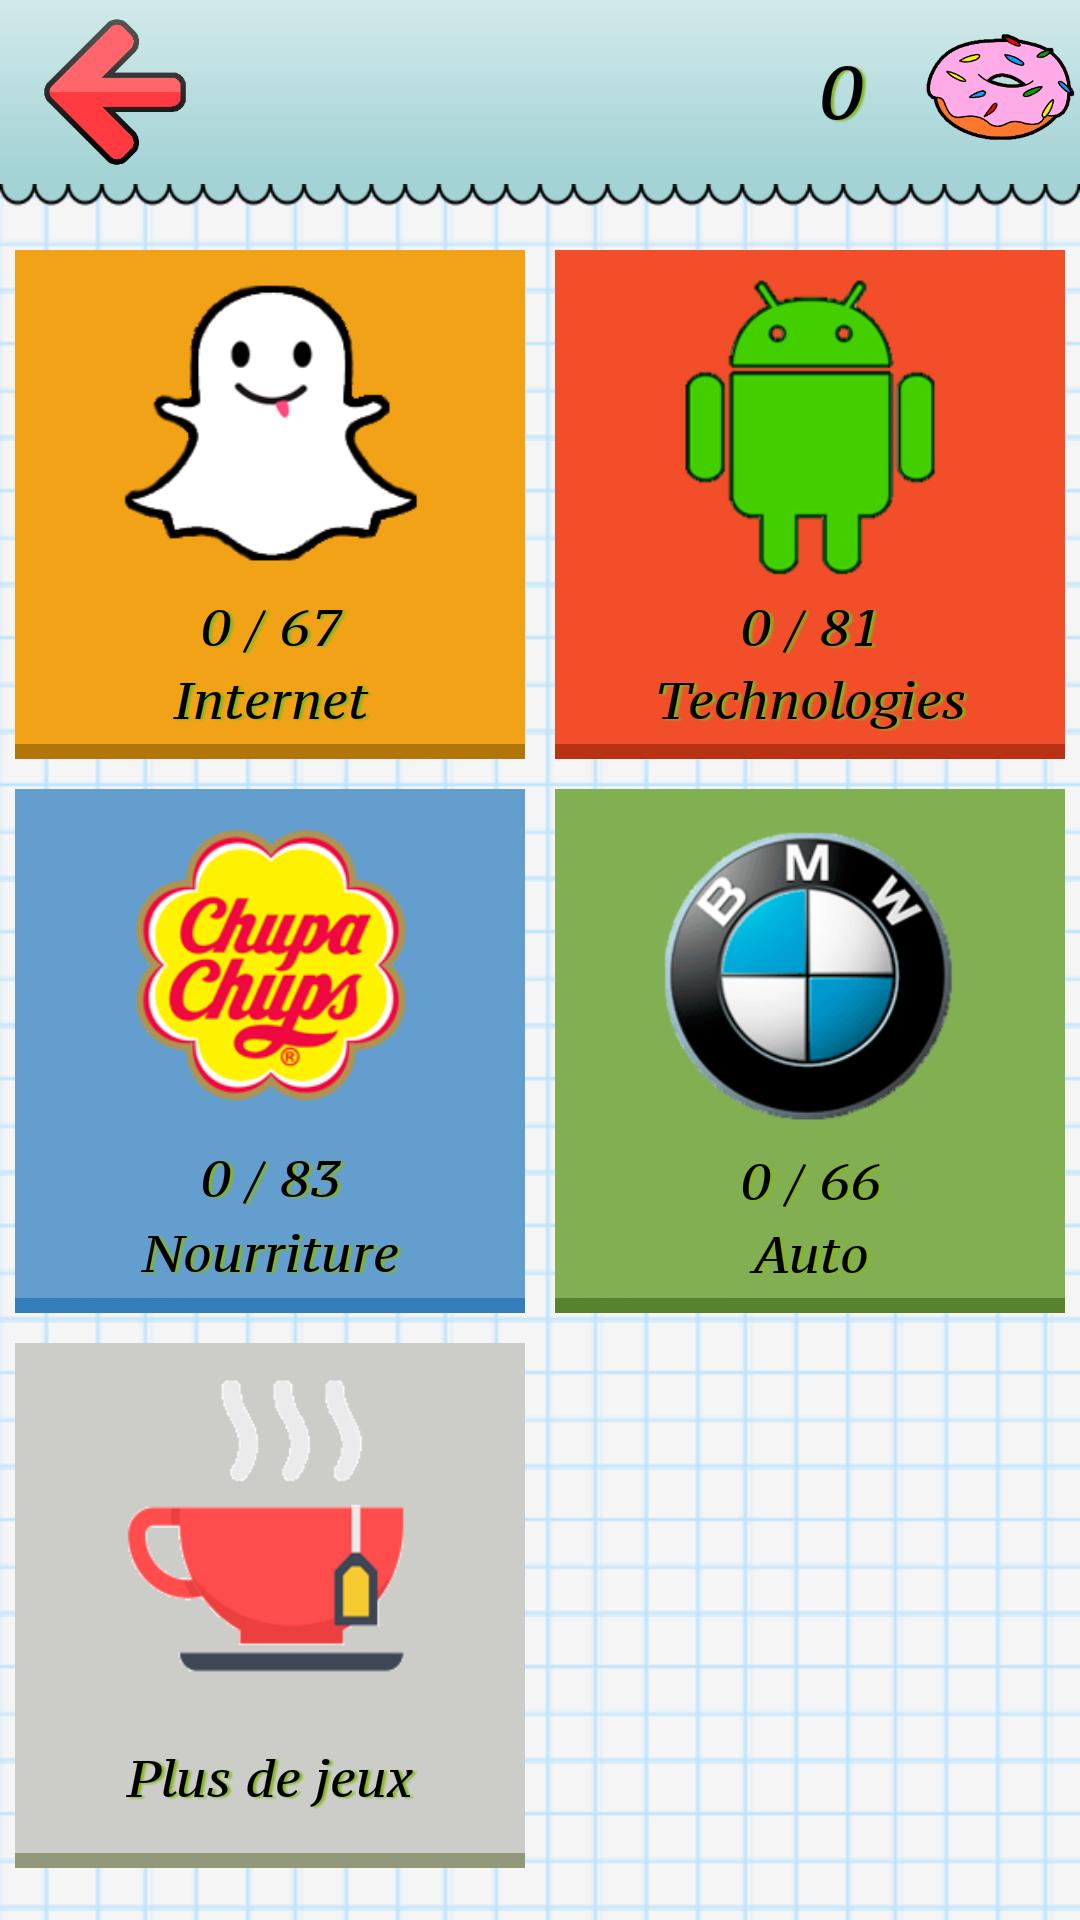 logo quiz 2015 android 14 20 test photos. Black Bedroom Furniture Sets. Home Design Ideas